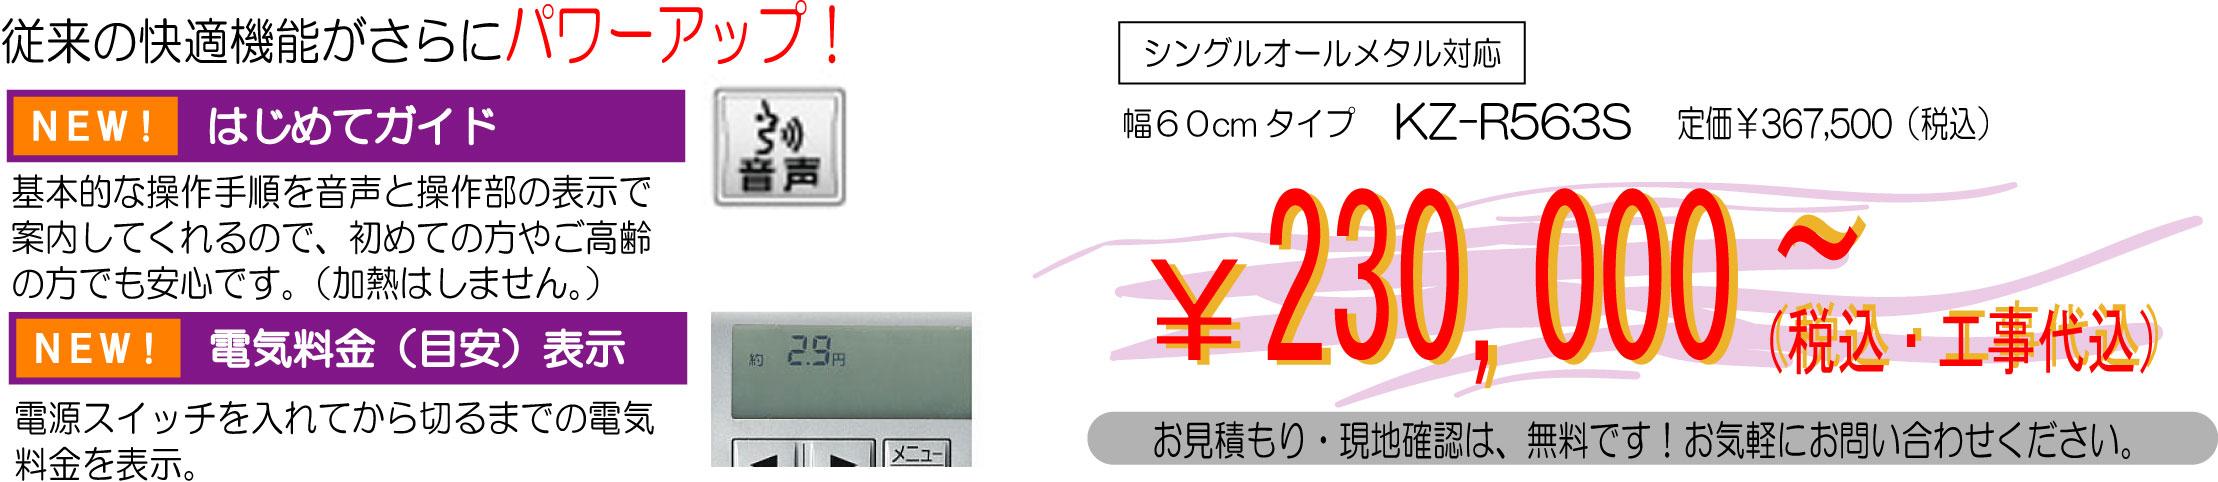 KuraSi-natu-sin65-12.jpg